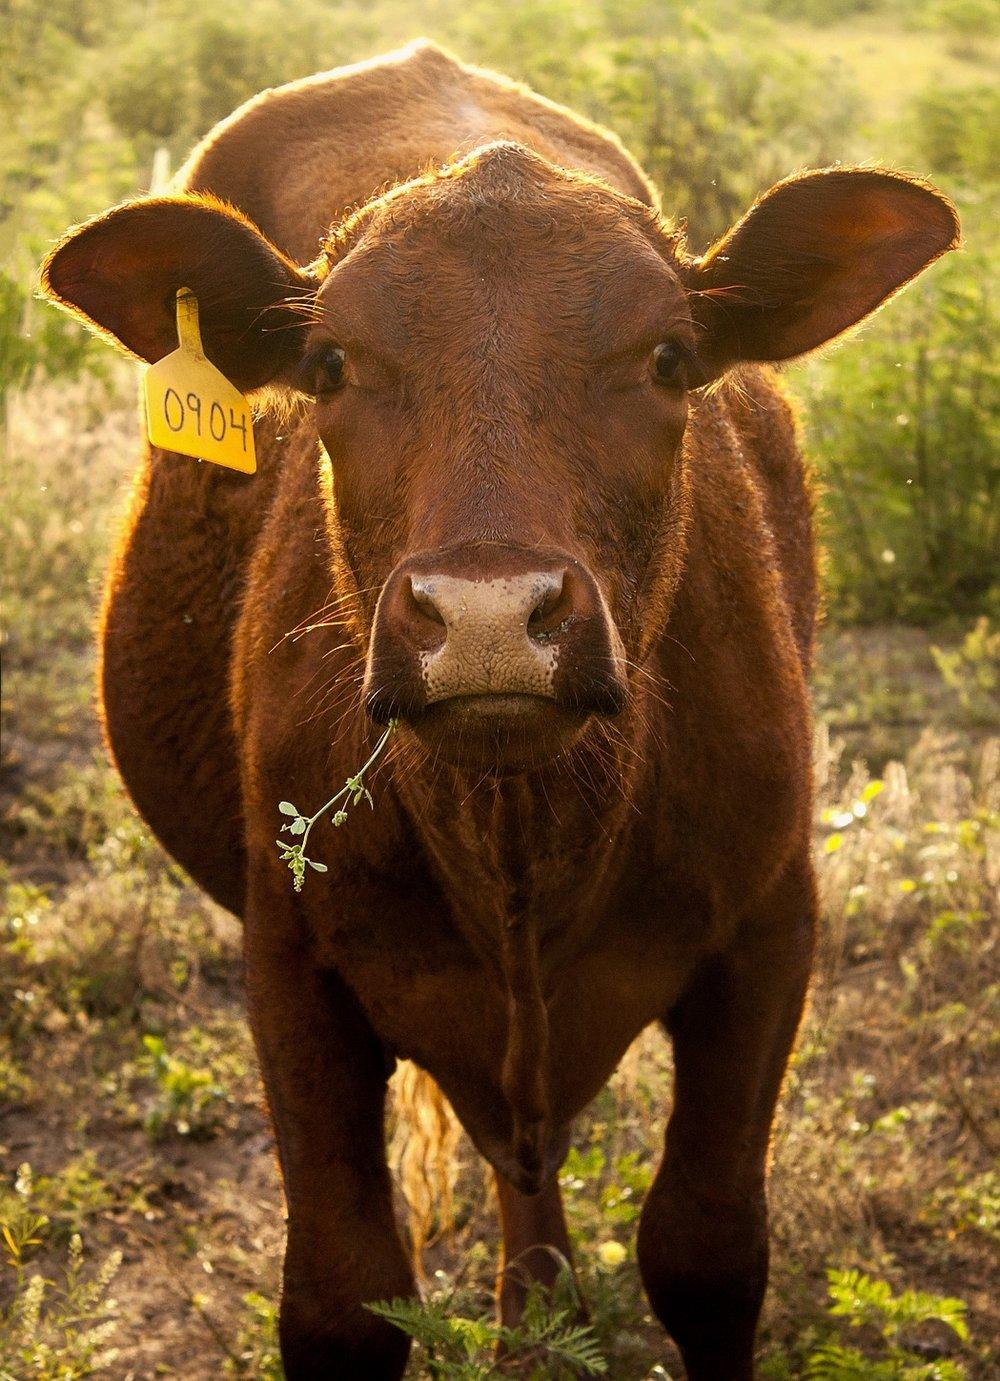 cow-2197082_1920.jpg